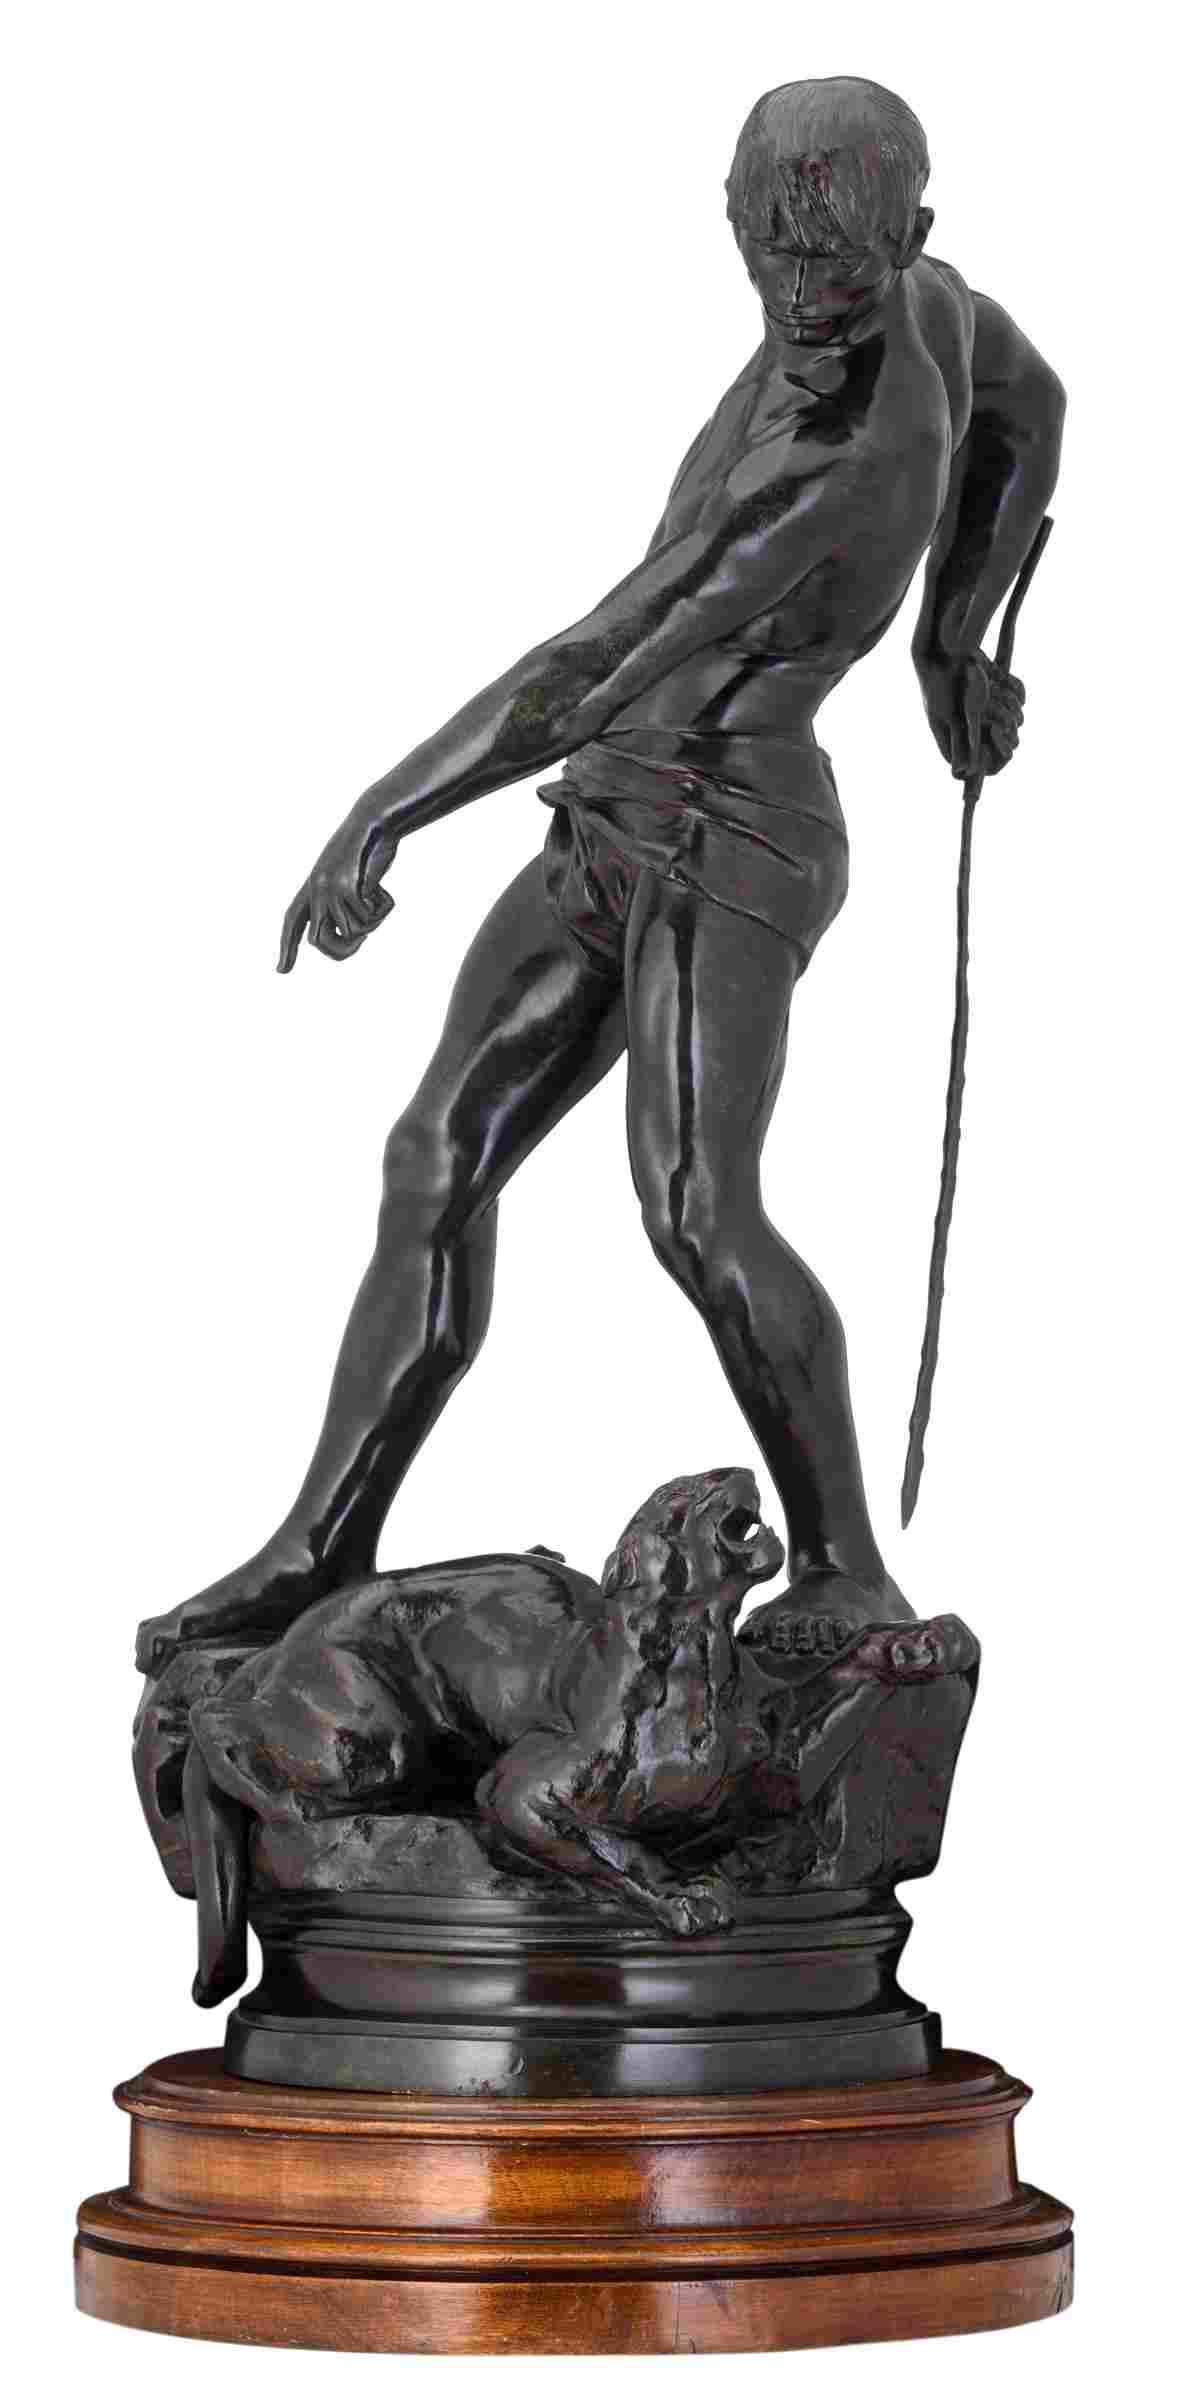 Ferrary M., 'Homme combattant une lionne', patinated